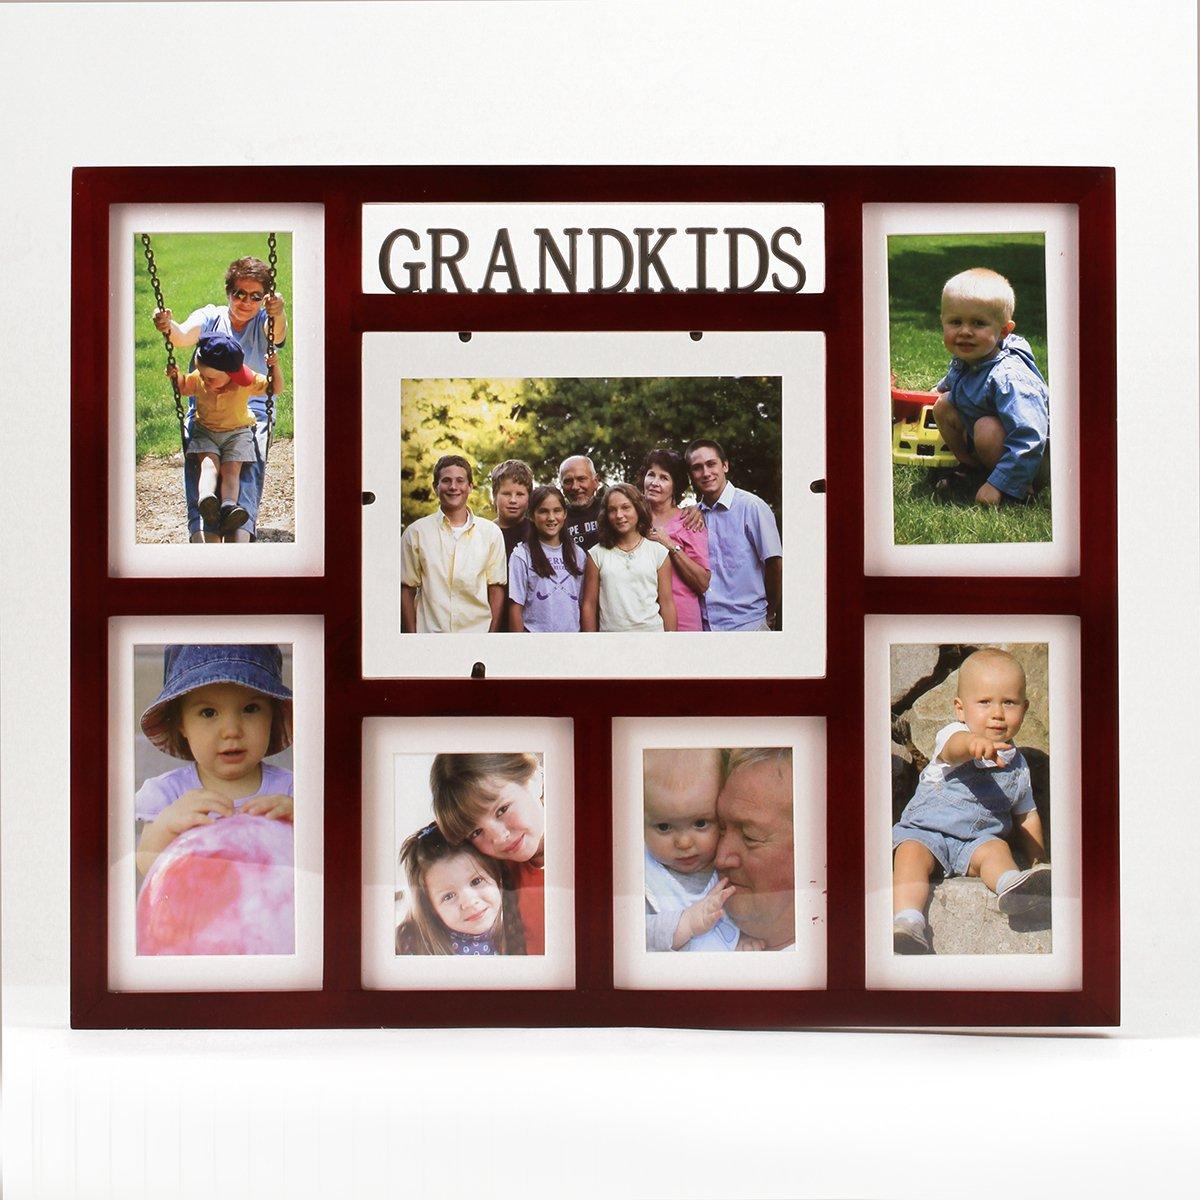 Amazon.com - Grandkids Photo Collage Frame -